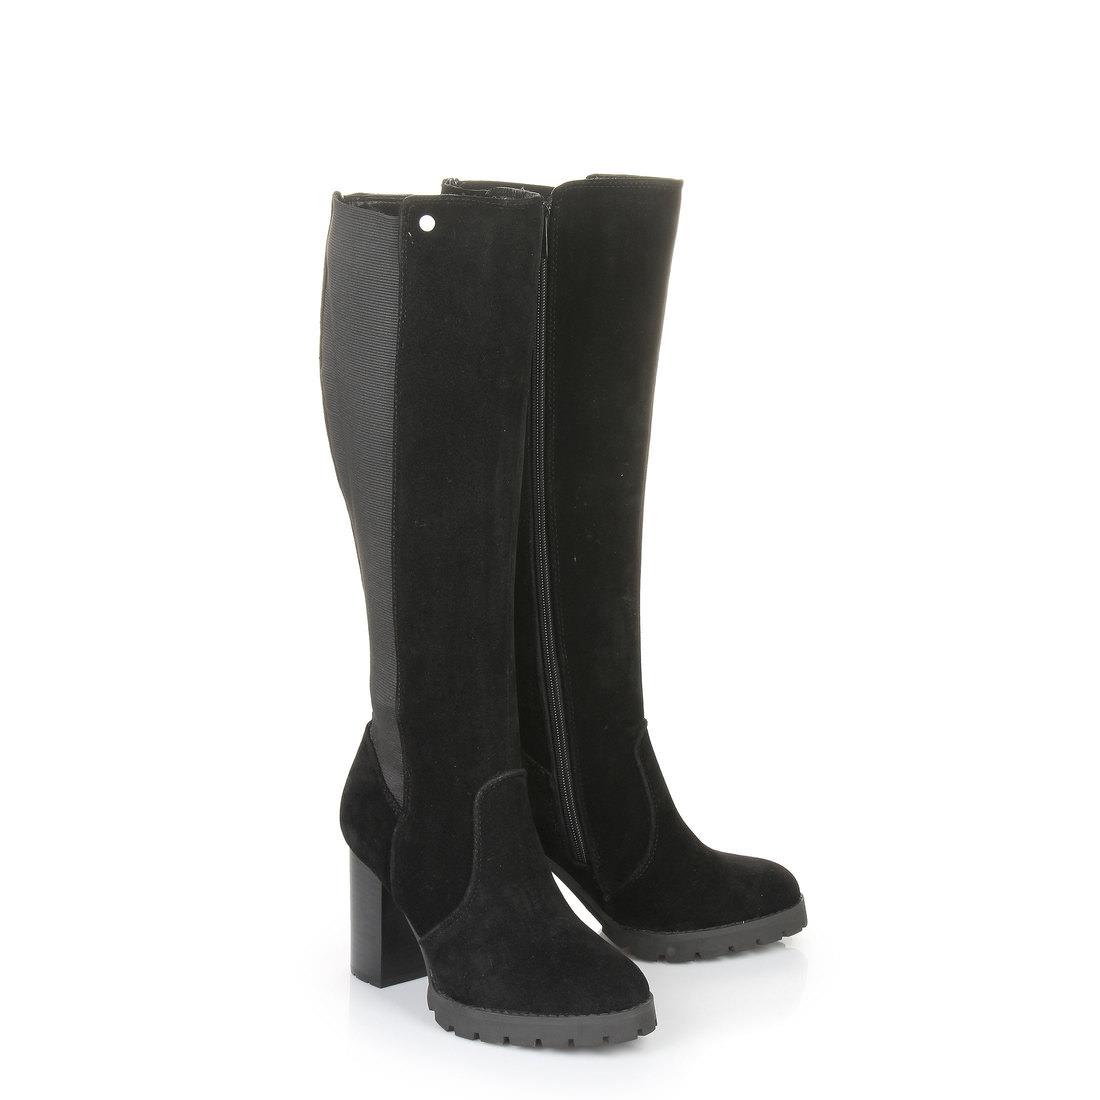 buffalo shoes damen b493c 72 s0019f imi suede stiefel schwarz black 01 37 eu. Black Bedroom Furniture Sets. Home Design Ideas